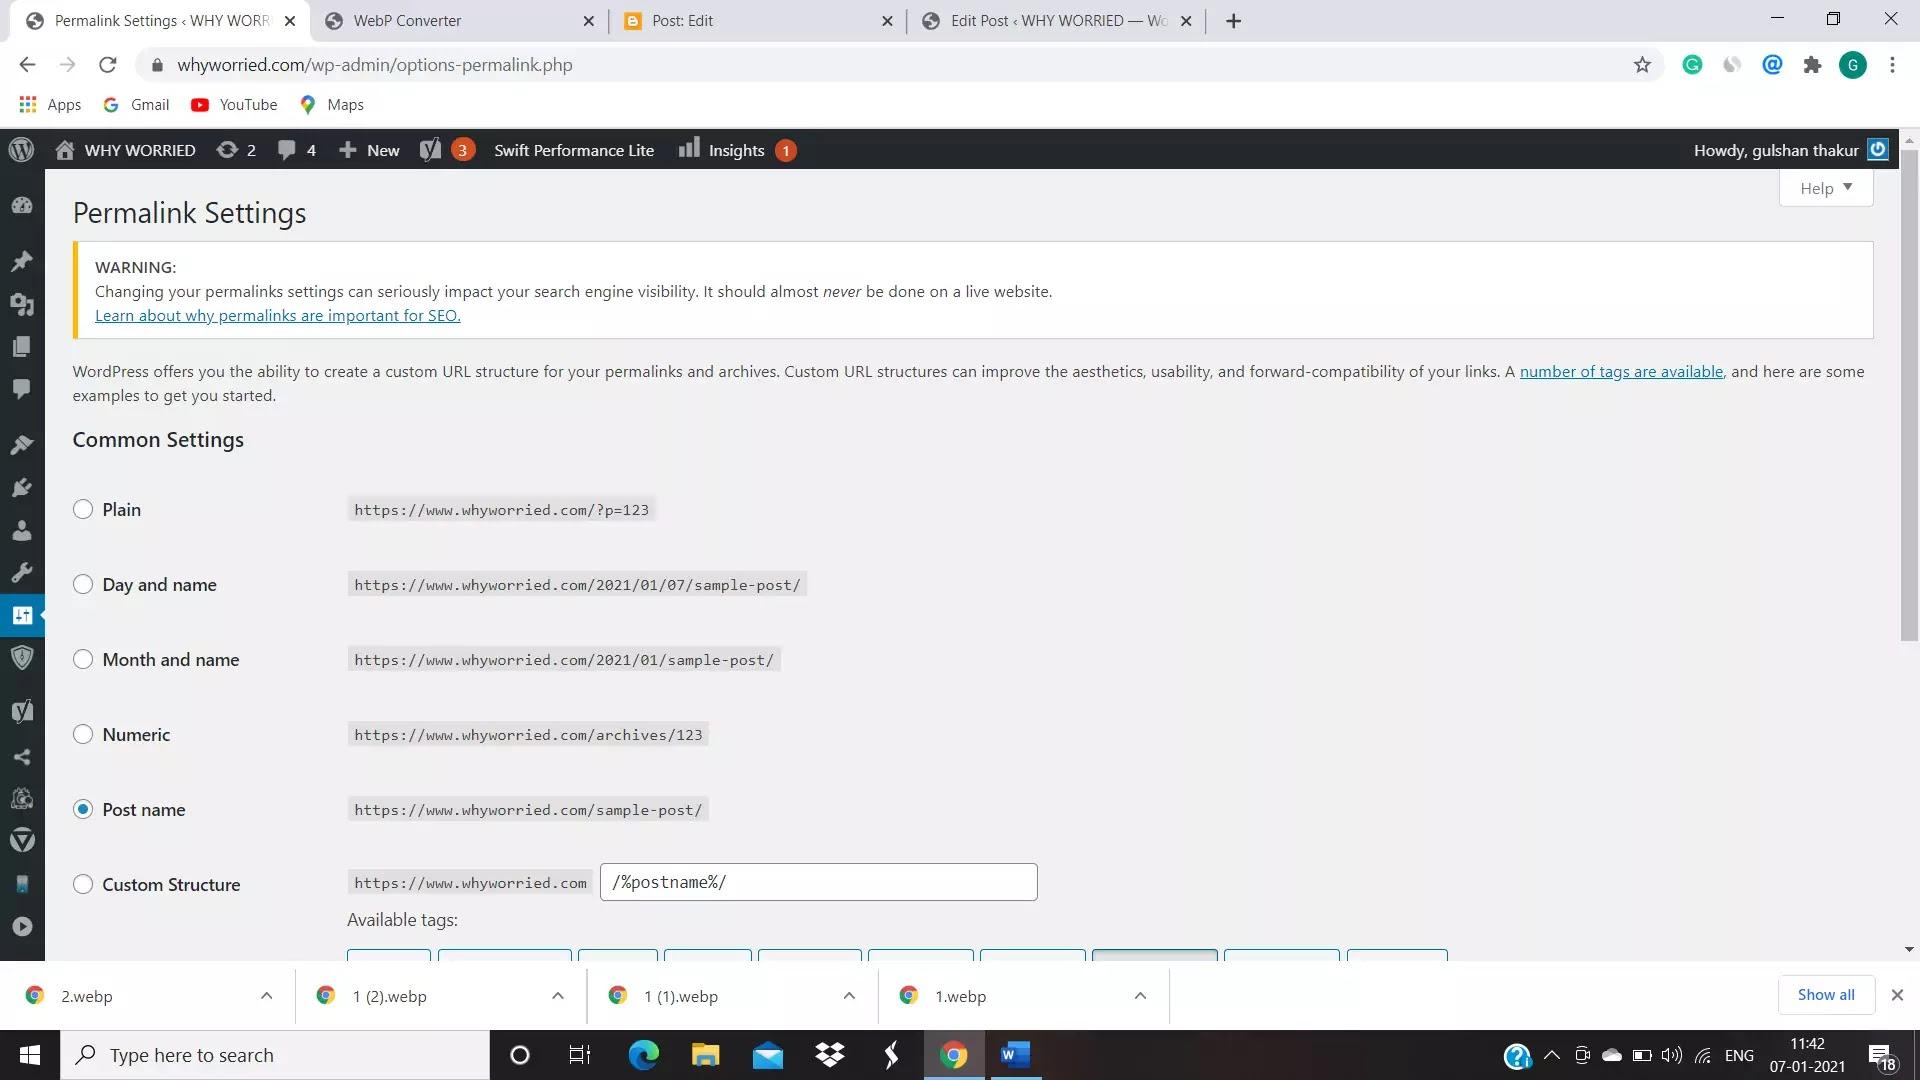 image of permalink settings in WordPress